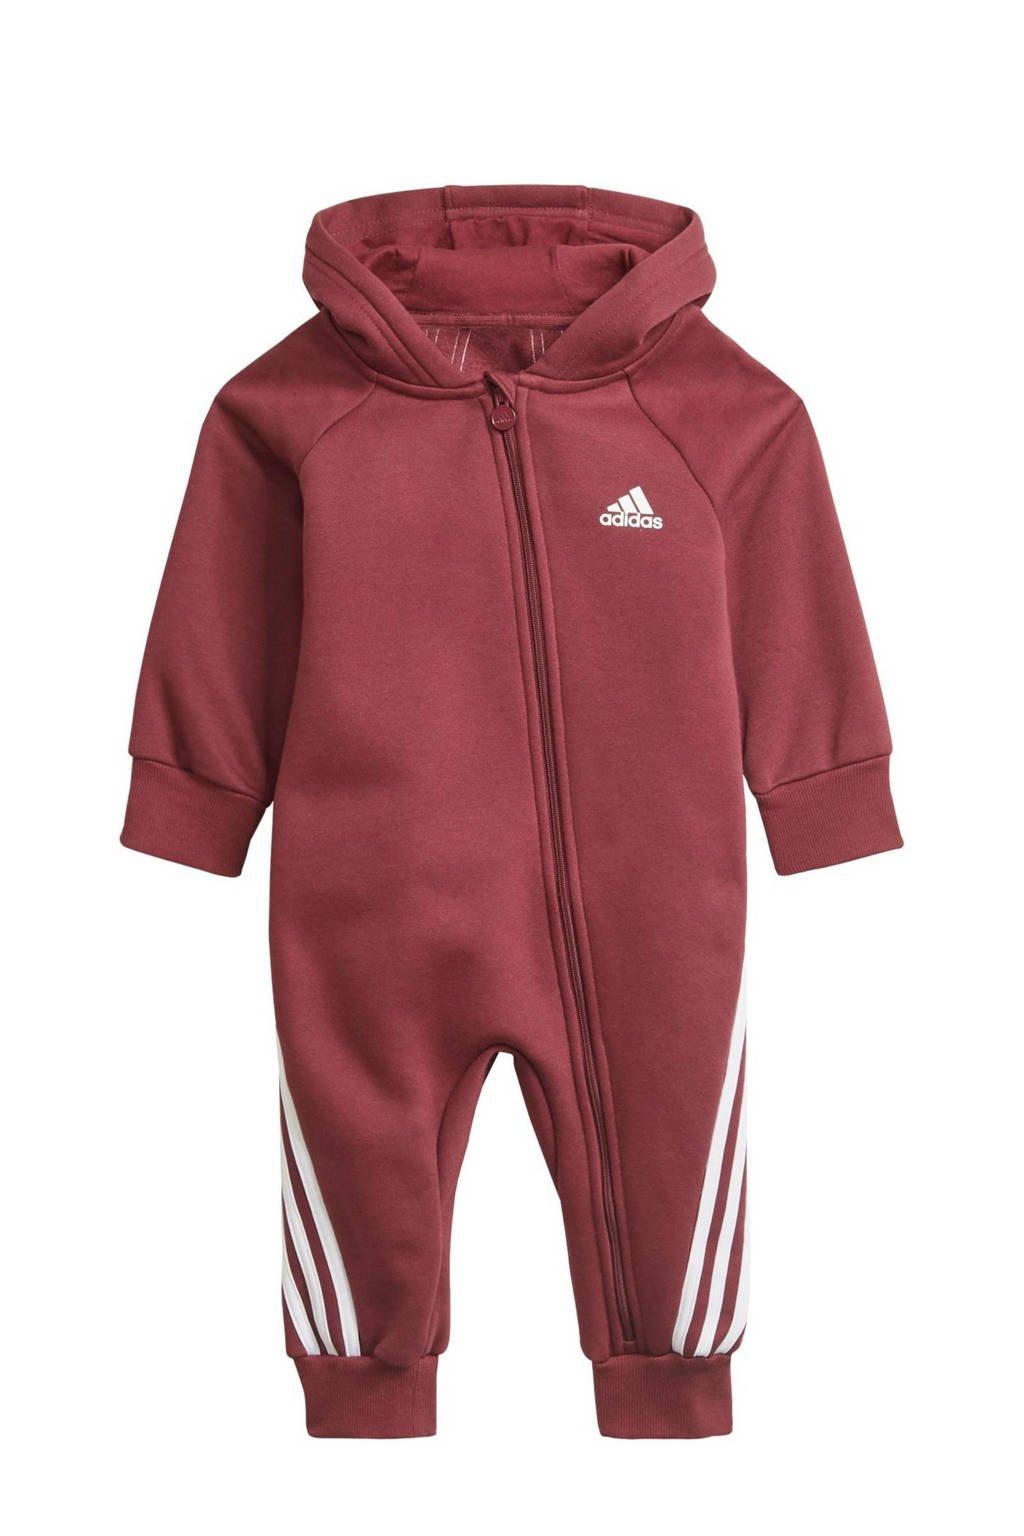 adidas Performance fleece onesie donkerrood/wit, Donkerrood/wit